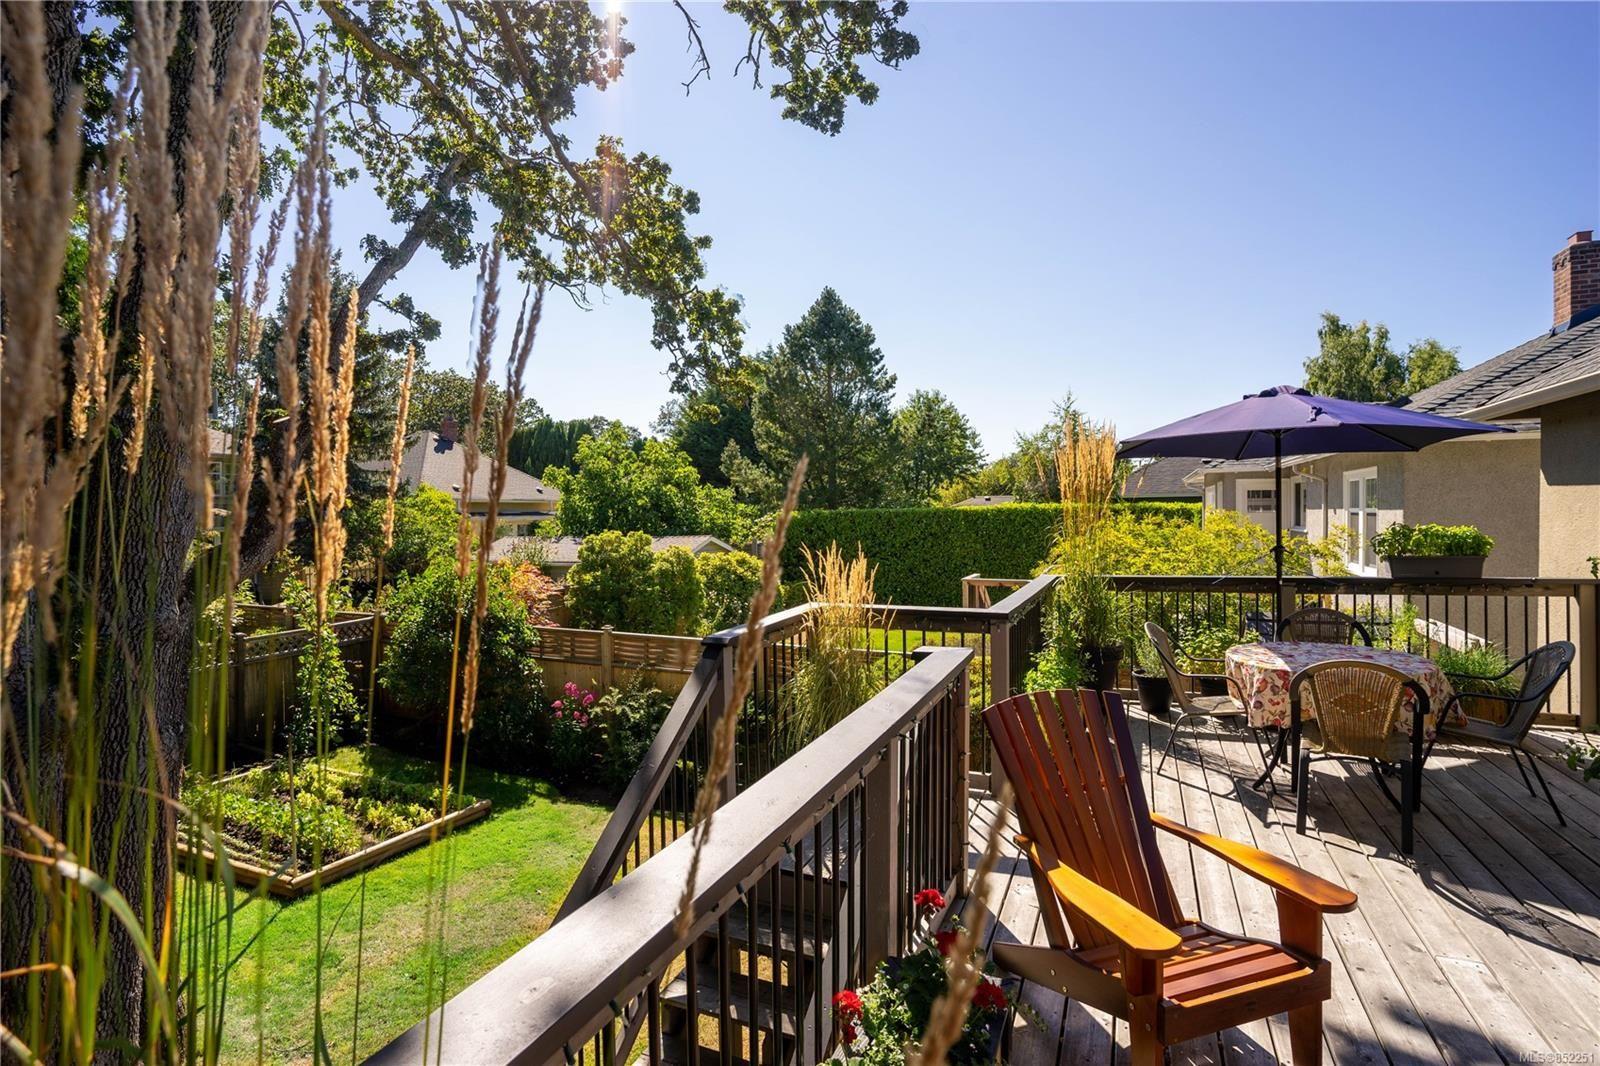 Photo 29: Photos: 2363 Pacific Ave in : OB Estevan House for sale (Oak Bay)  : MLS®# 852251